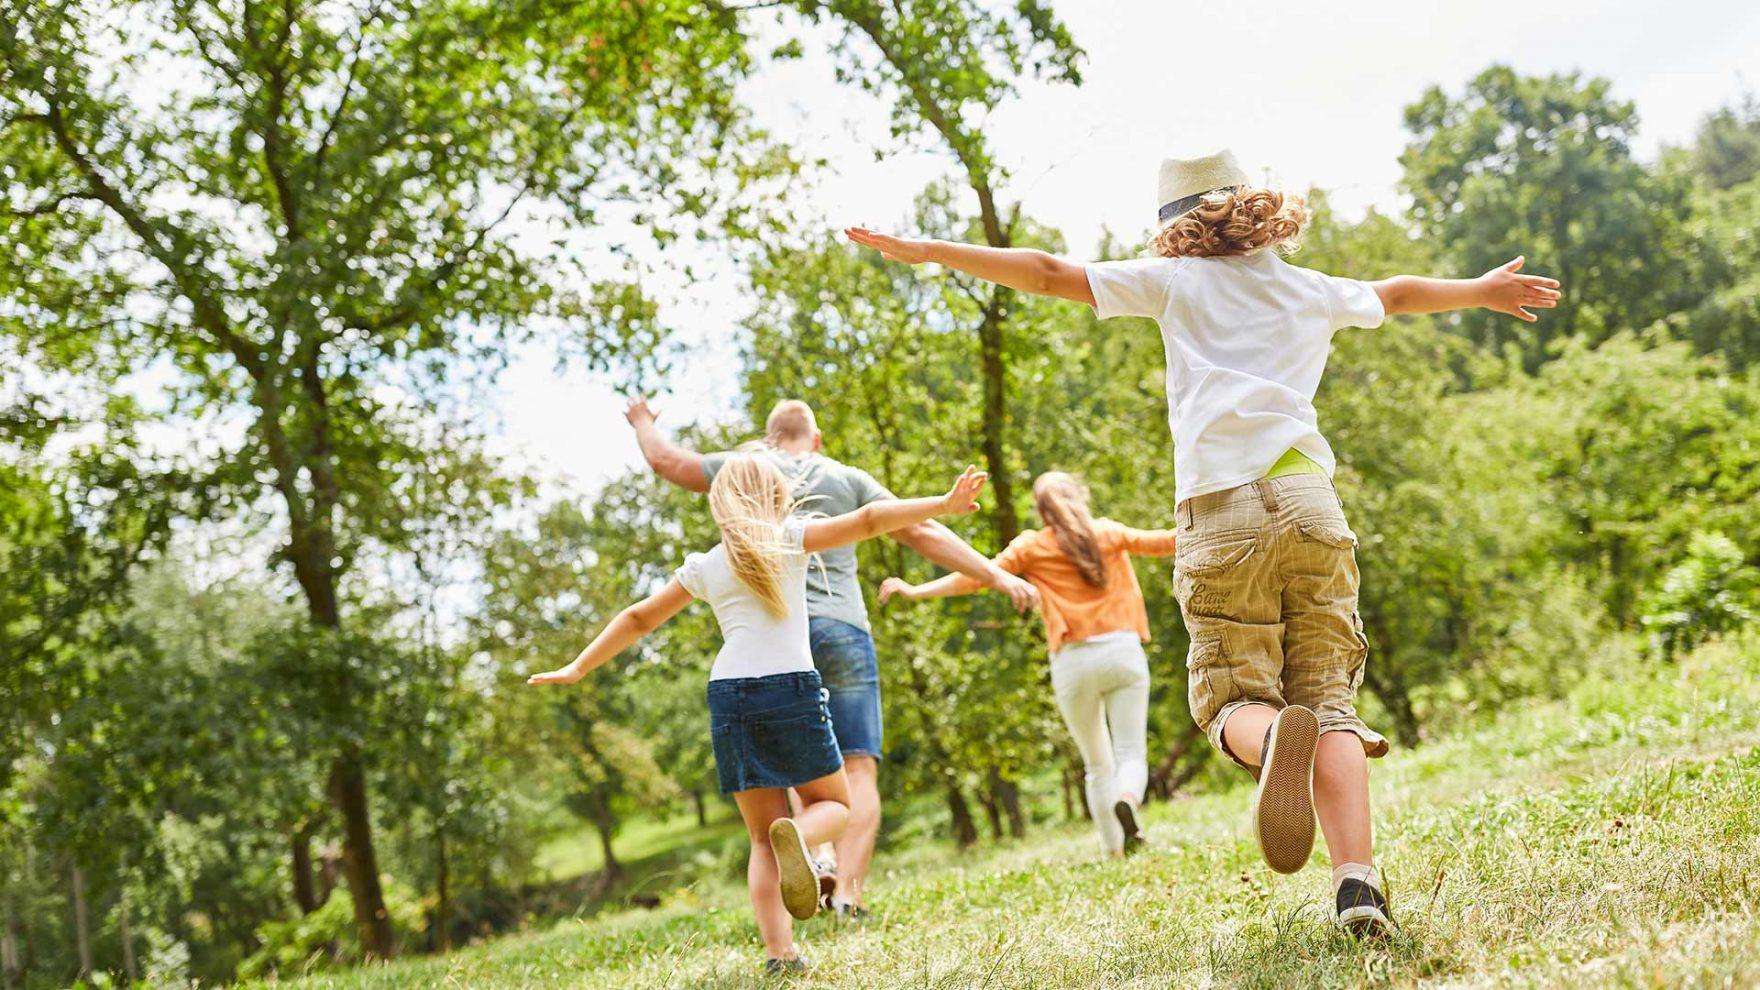 Vacanze estive a Merano e dintorni - Vacanze in famiglia